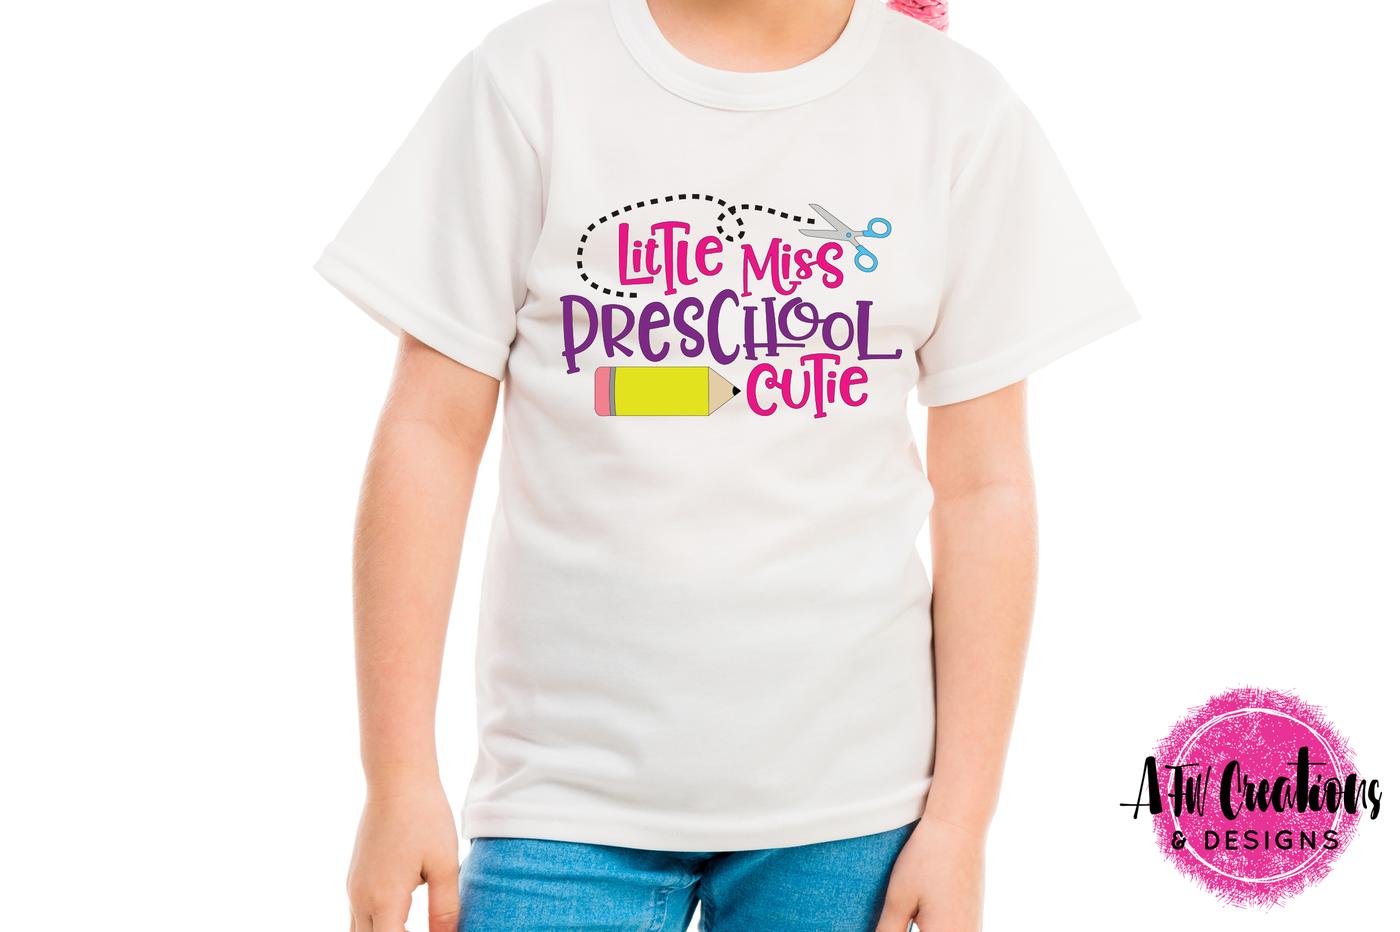 Little Miss Preschool Cutie Svg Dxf Eps Cut File By Afw Designs Thehungryjpeg Com